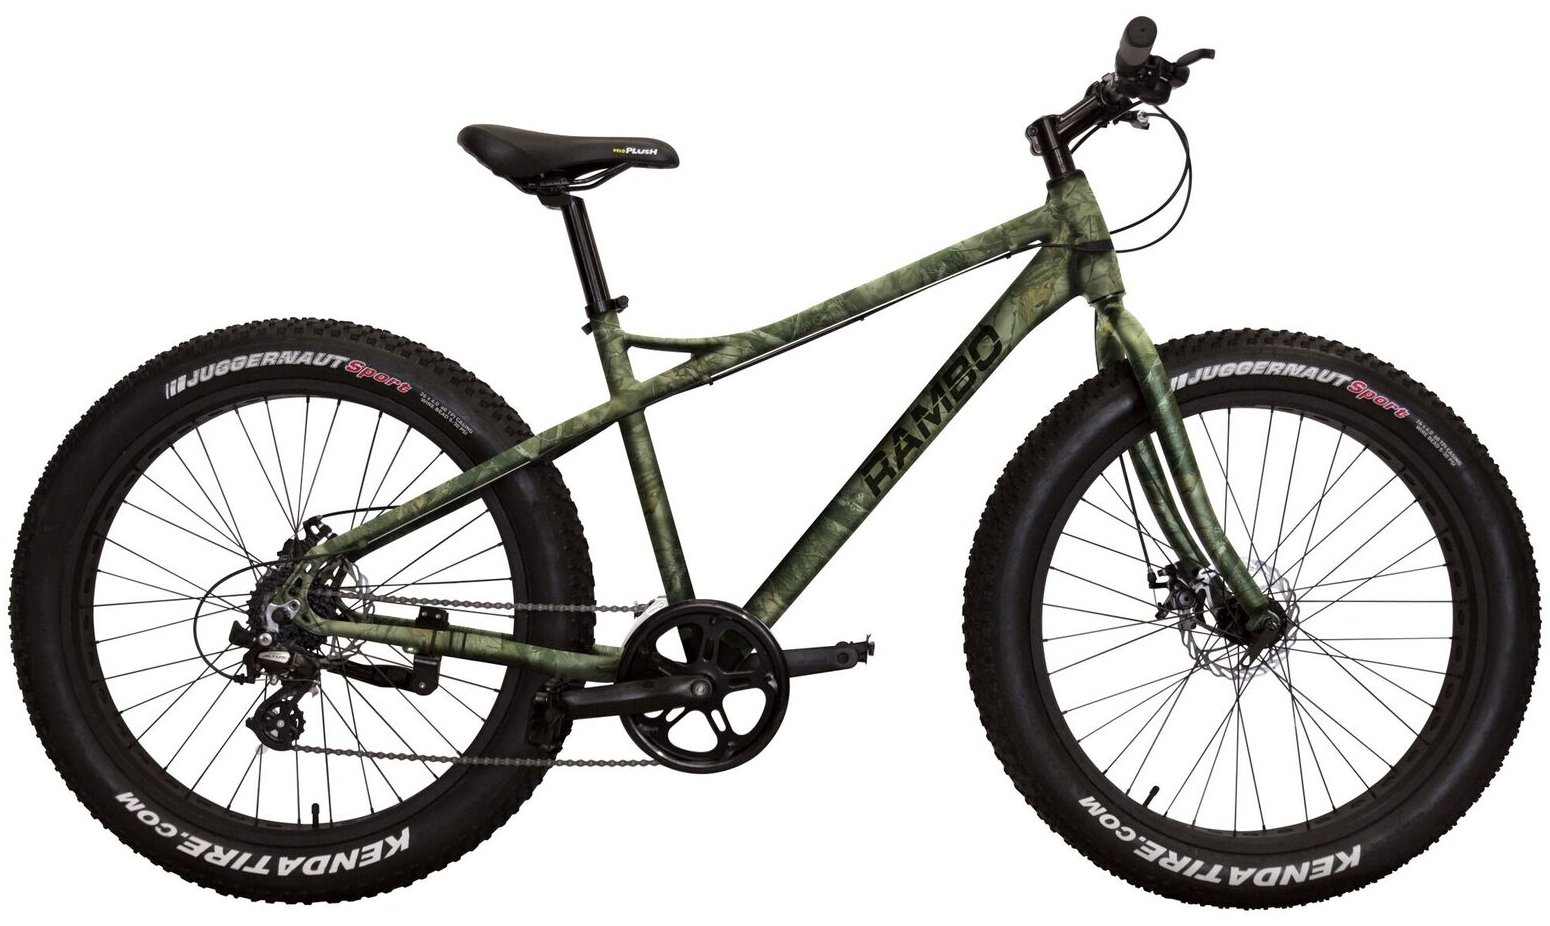 Rambo R35c Camo Fat Tire Bike